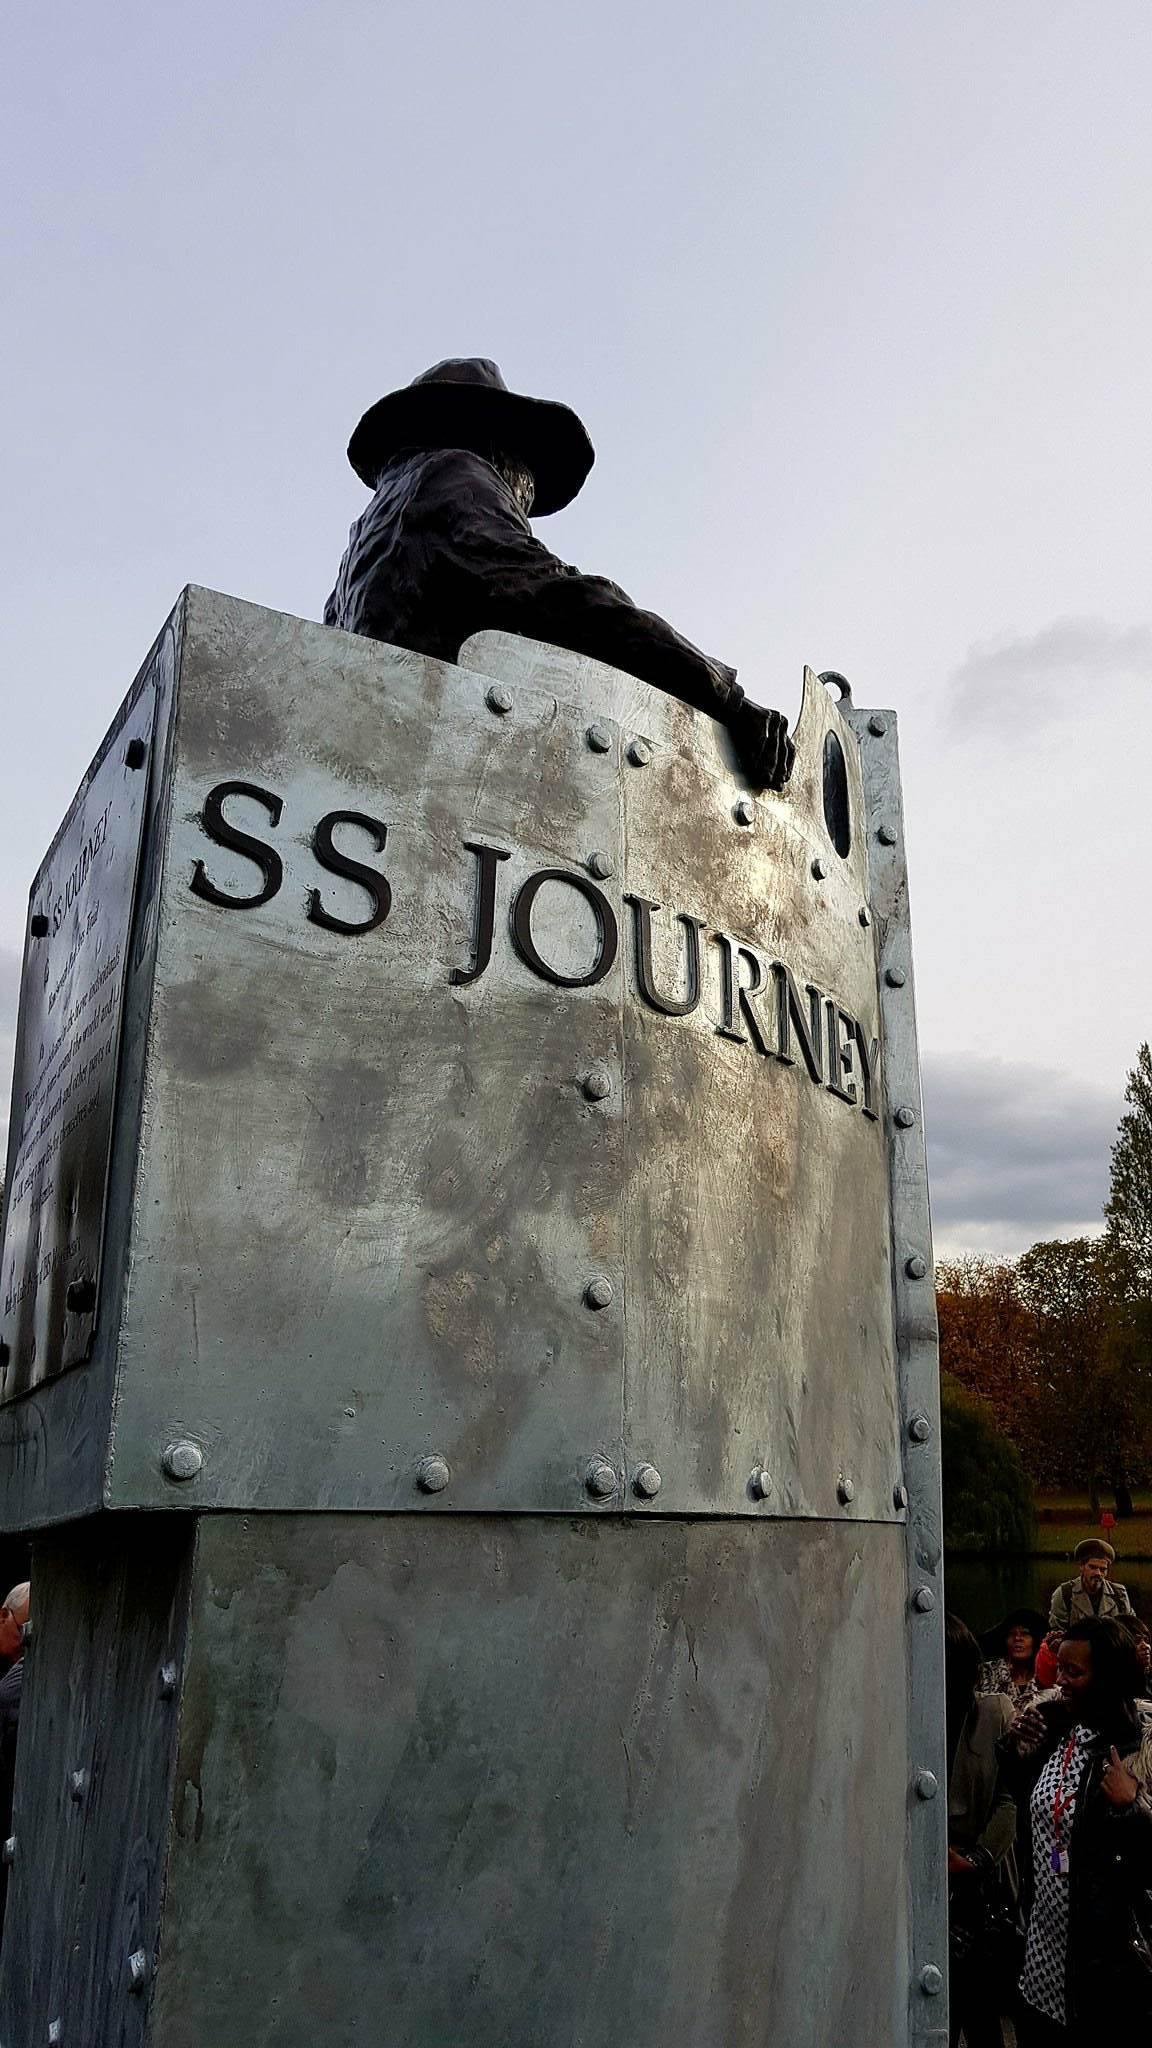 SS Journey